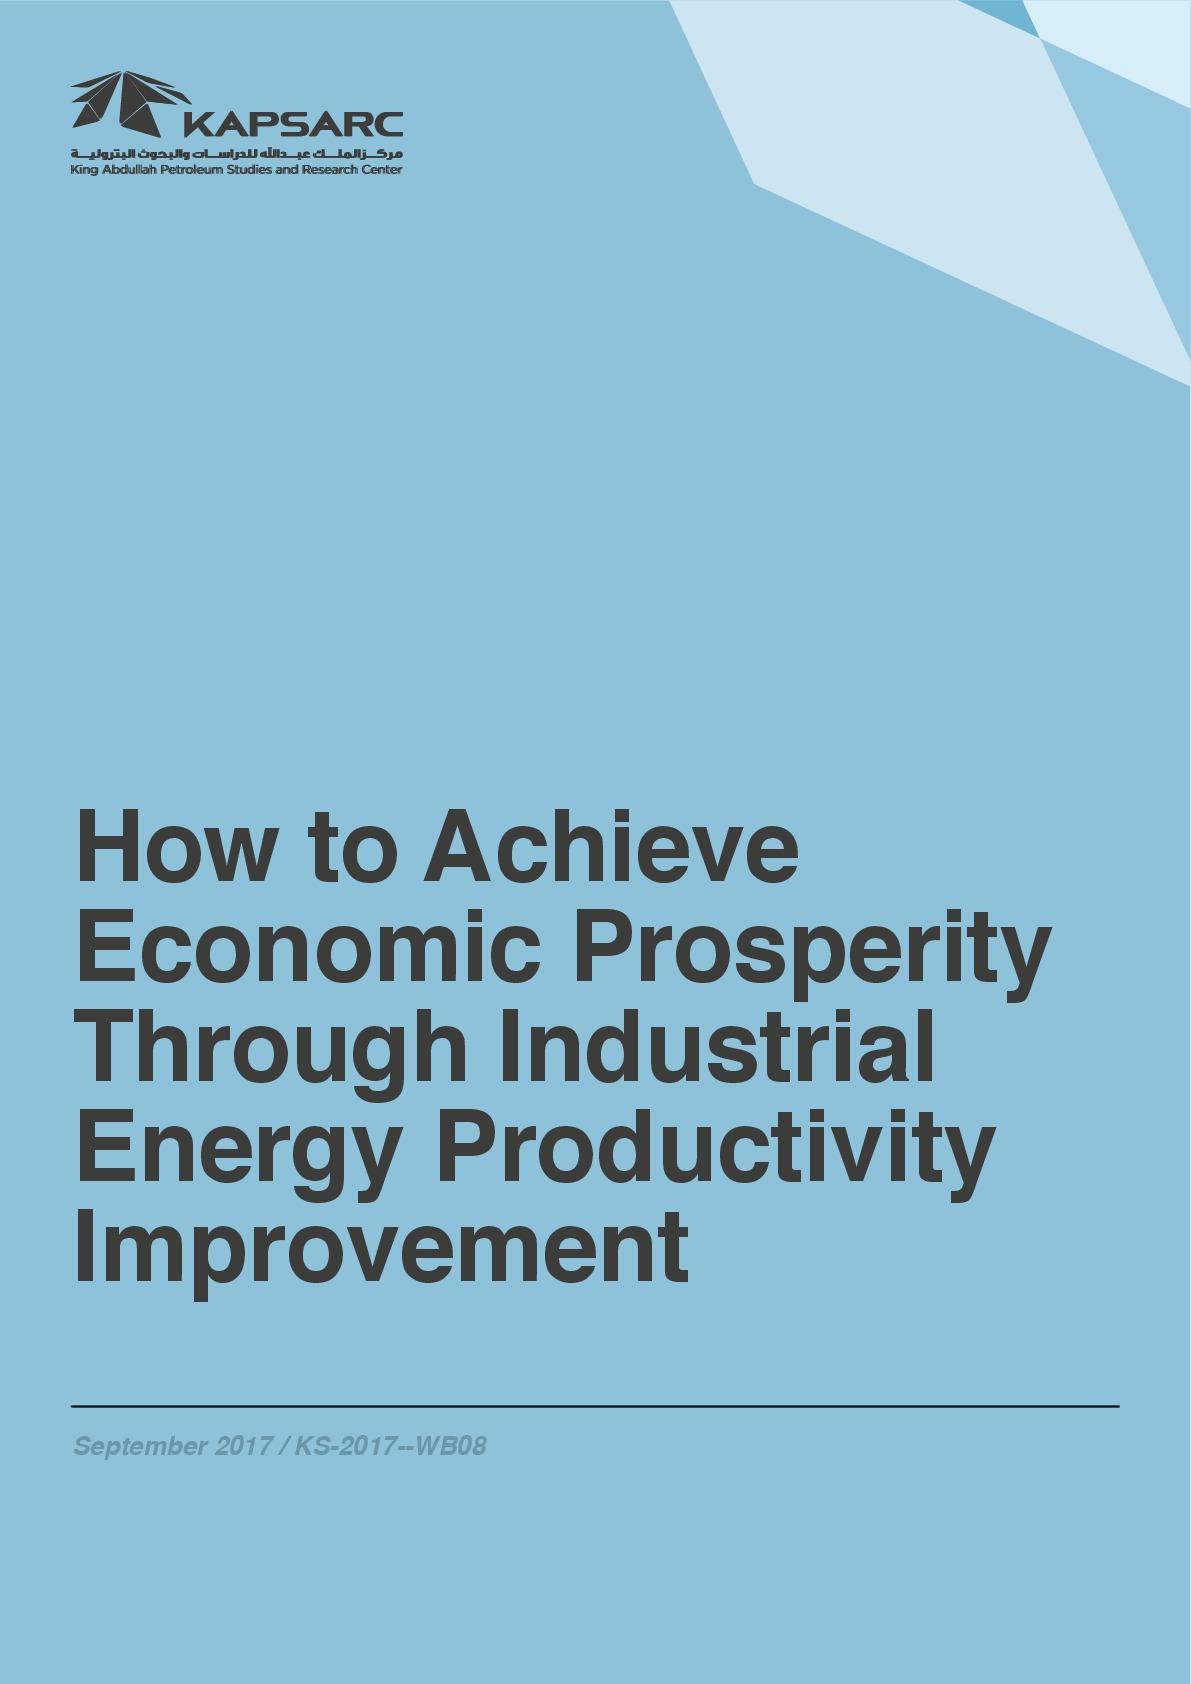 How to Achieve Economic Prosperity Through Industrial Energy Productivity Improvement